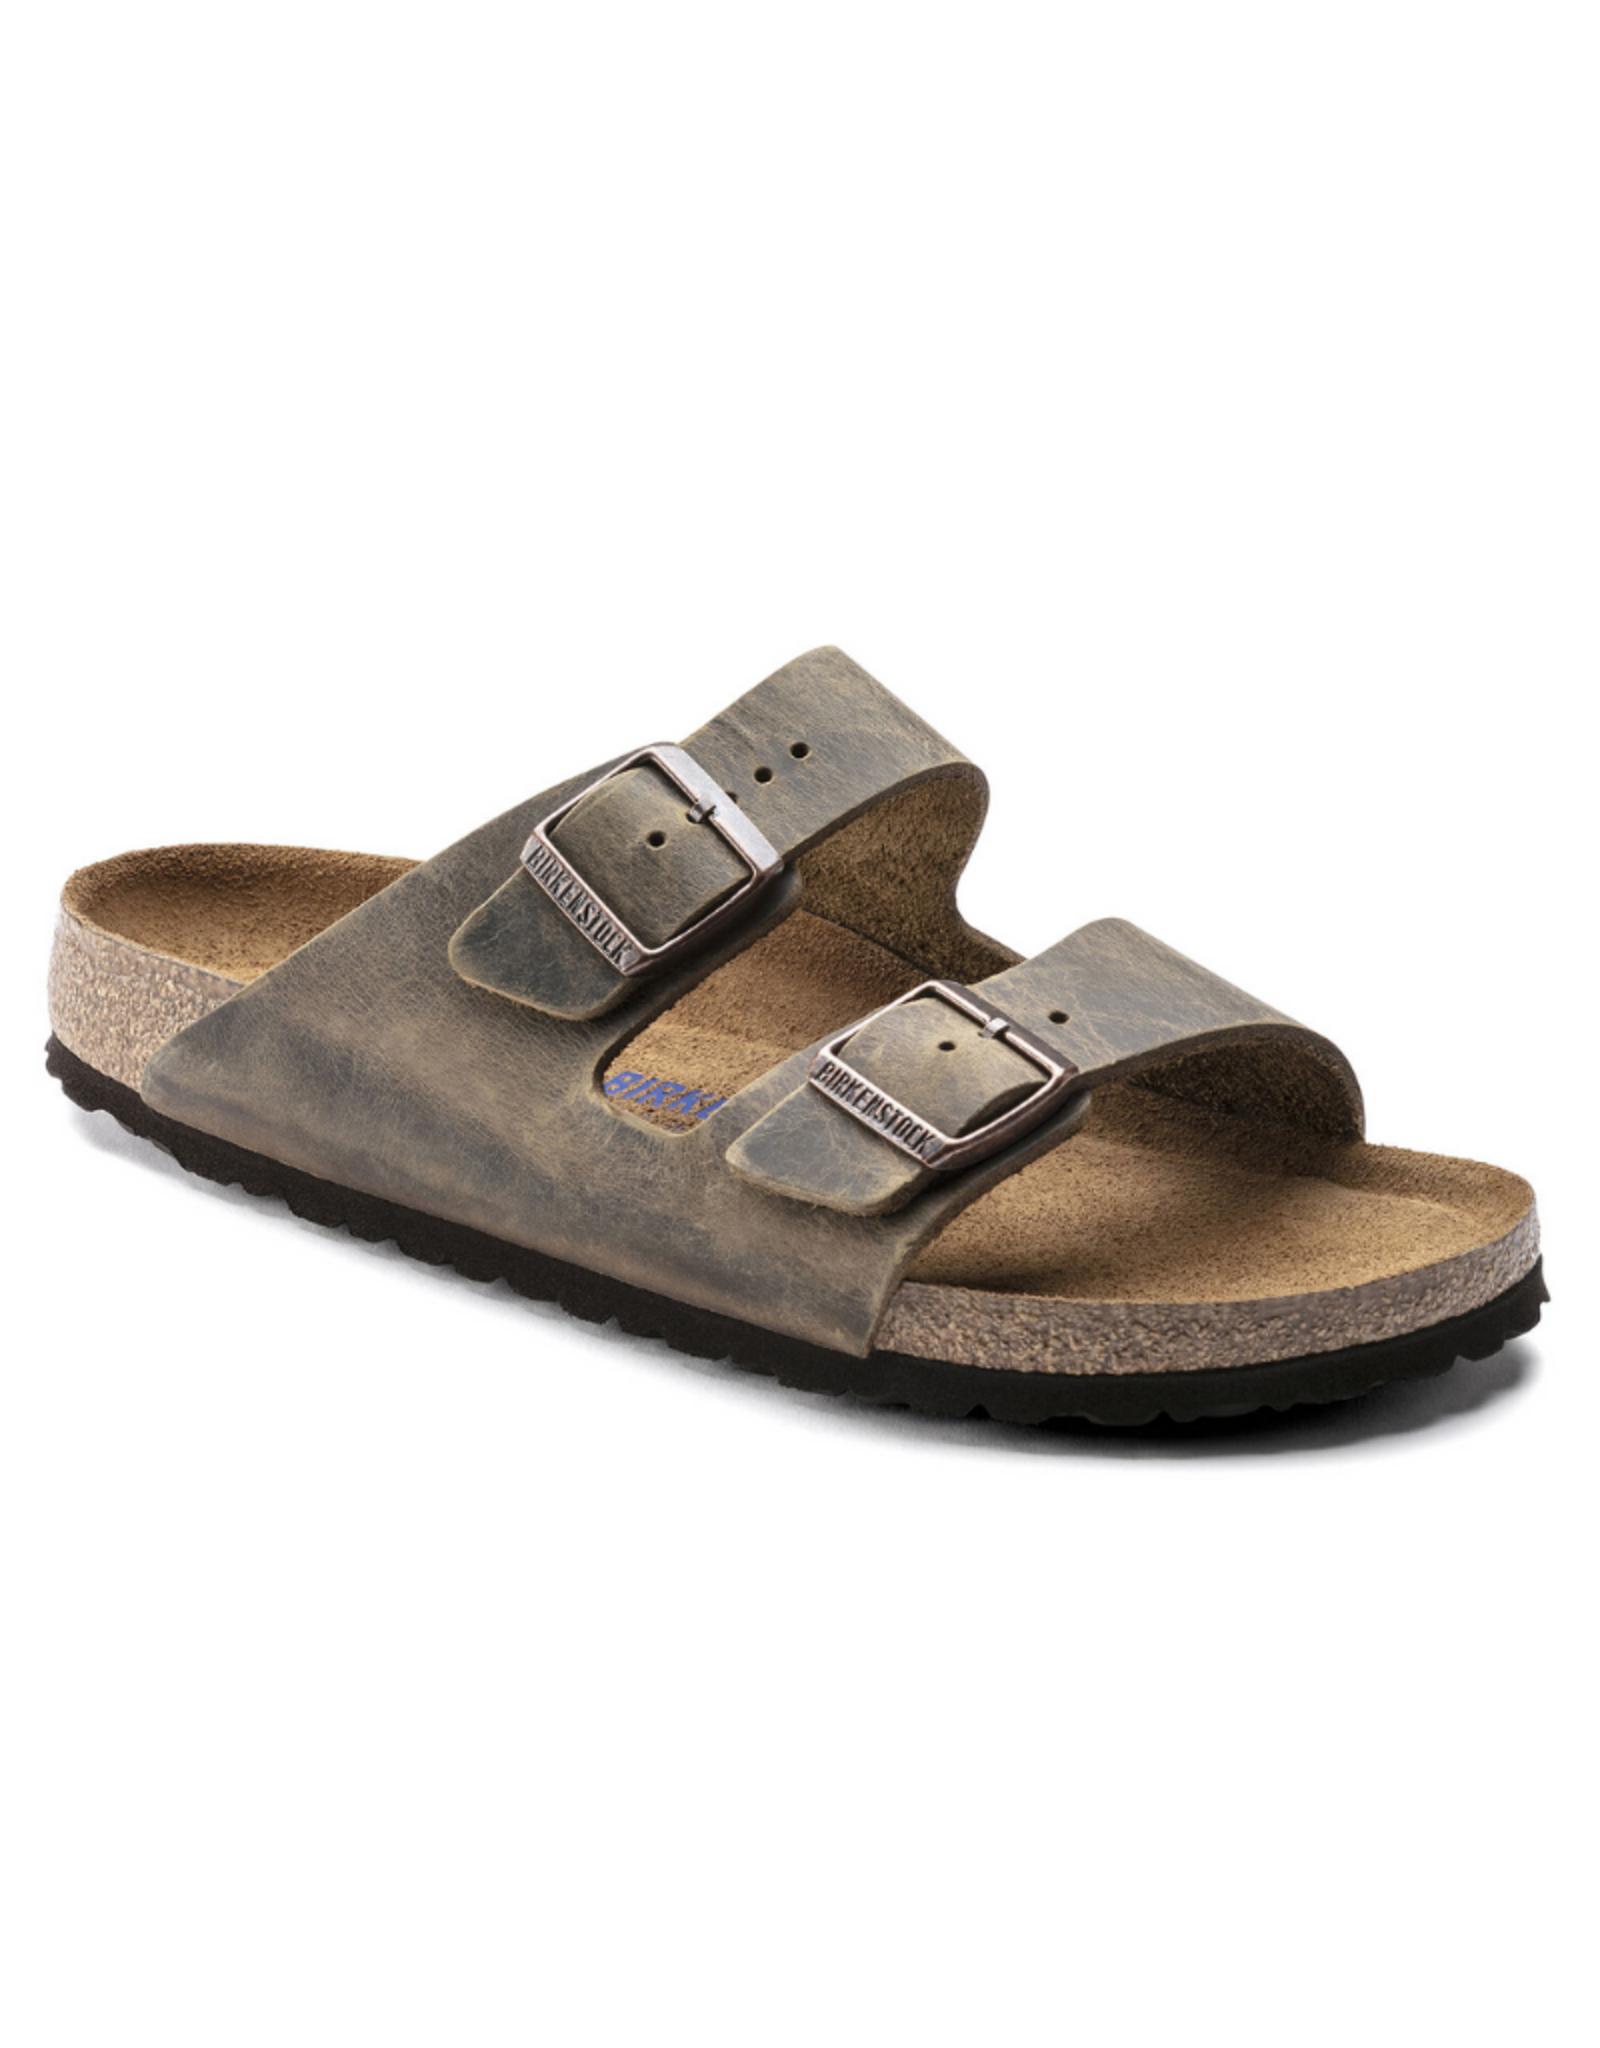 Arizona Mud Green Oiled Leather Soft Footbed